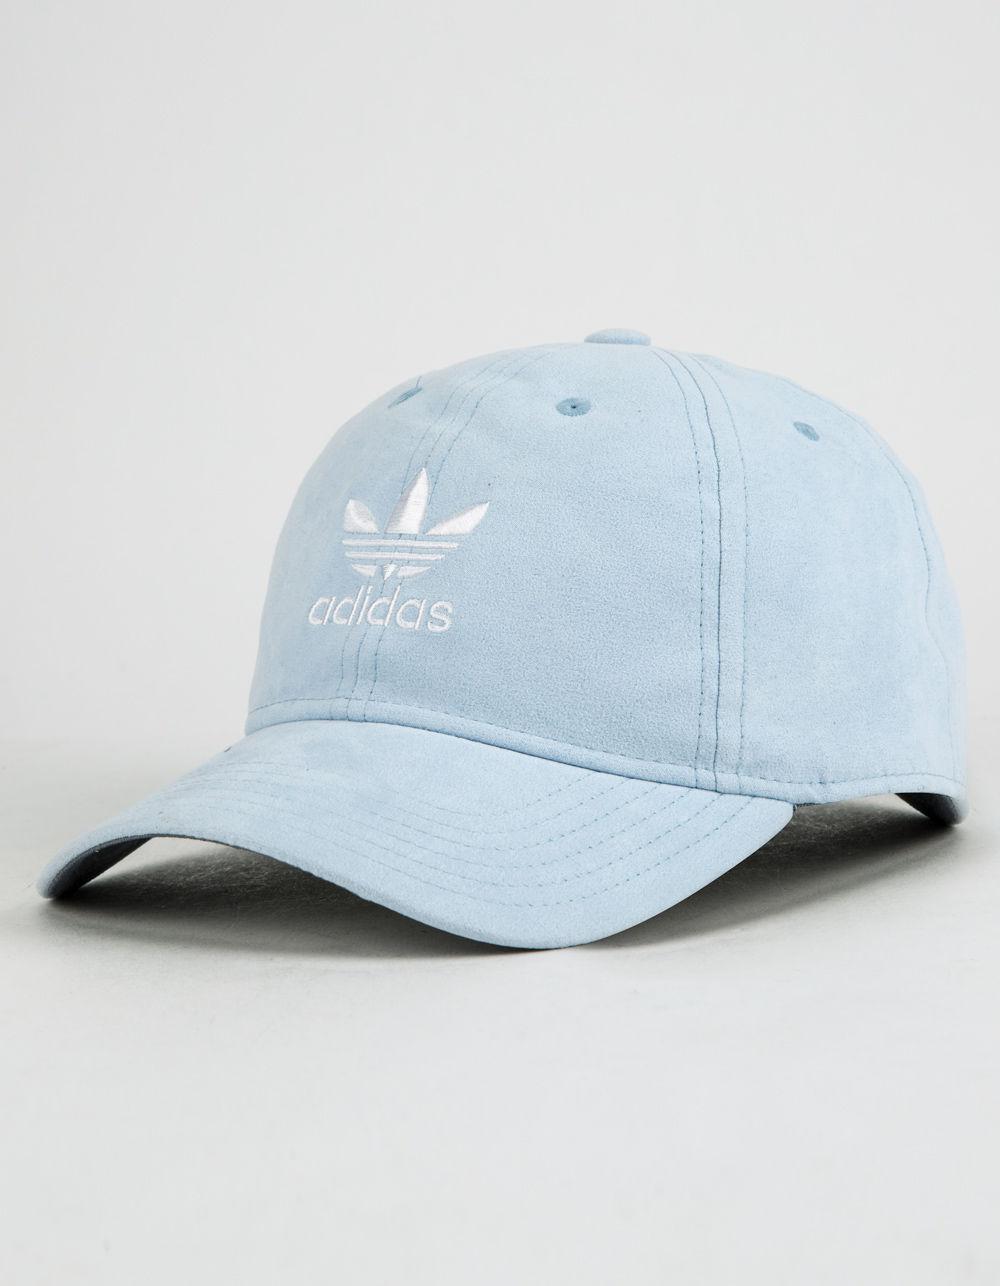 6c694336453 Lyst - adidas Originals Relaxed Plus Light Blue Womens Strapback Hat ...